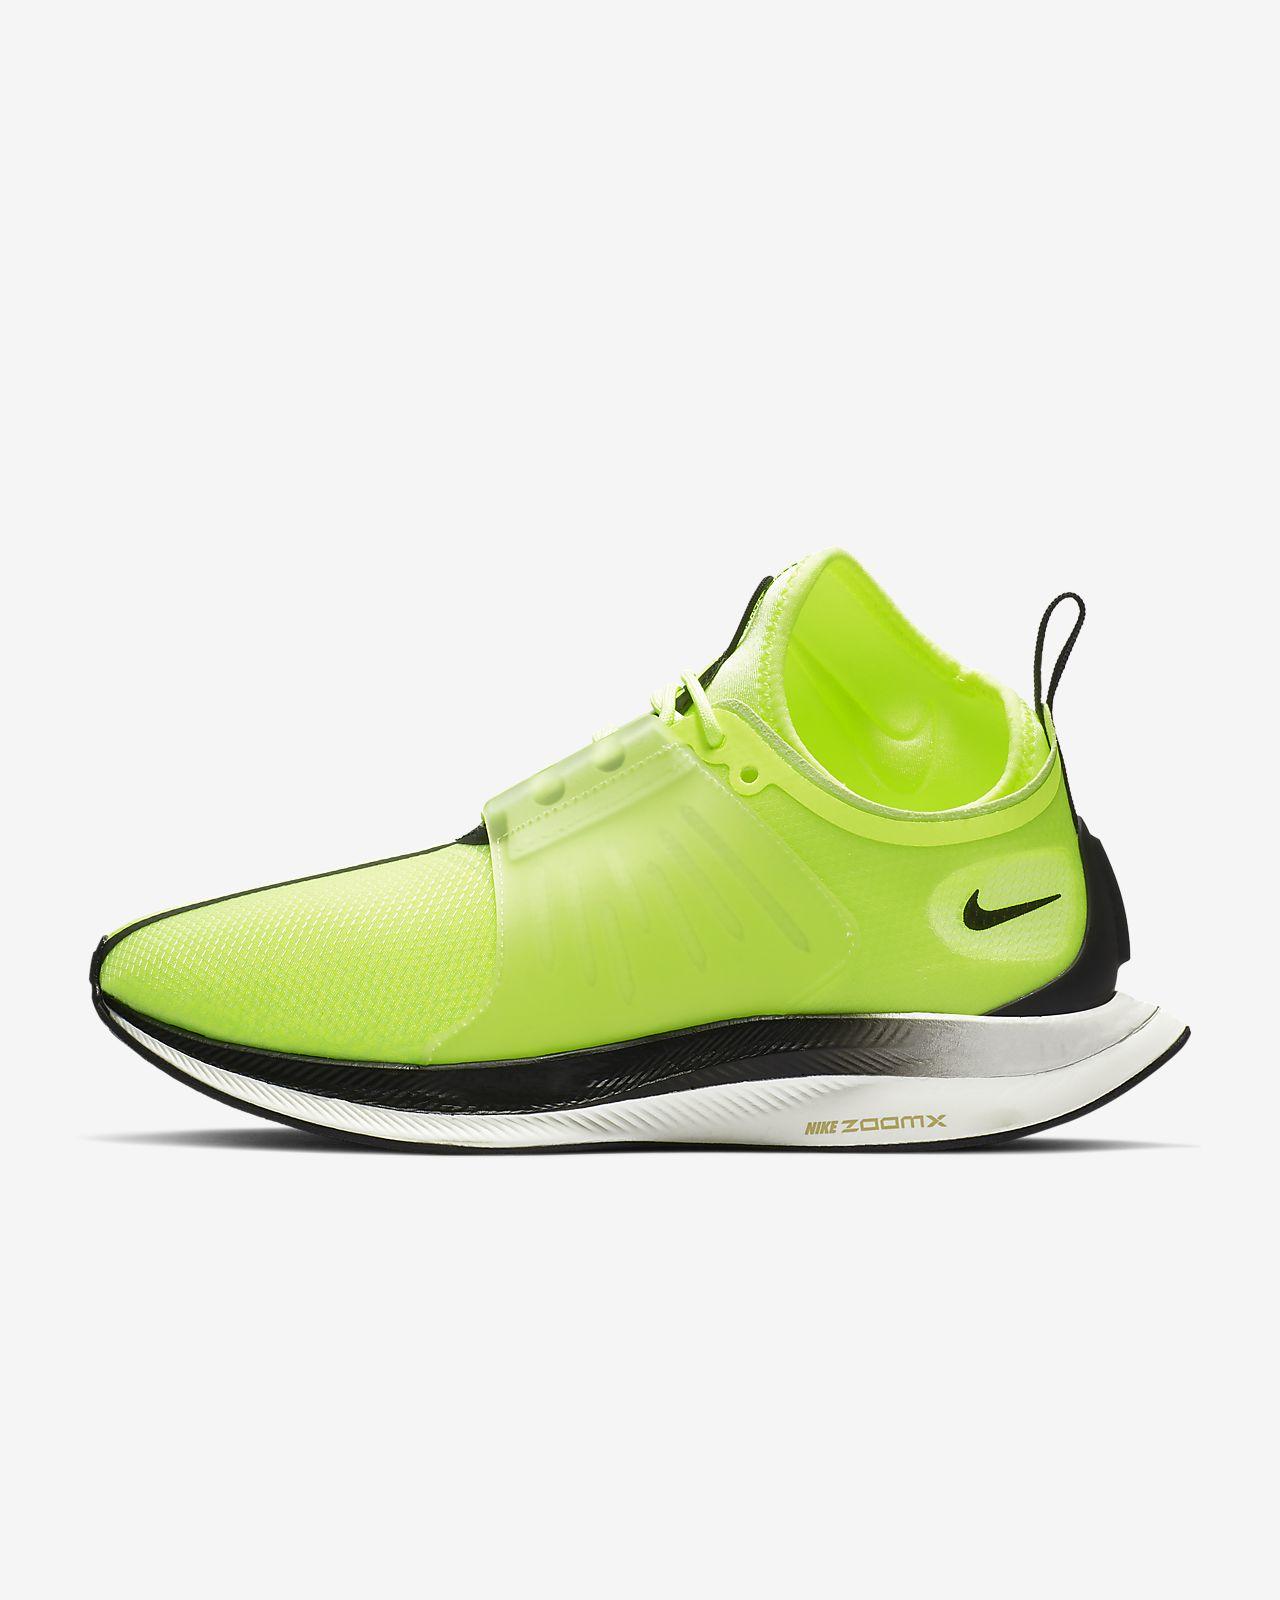 cheap for discount 98ab5 7af59 ... Löparsko Nike Zoom Pegasus Turbo XX för kvinnor